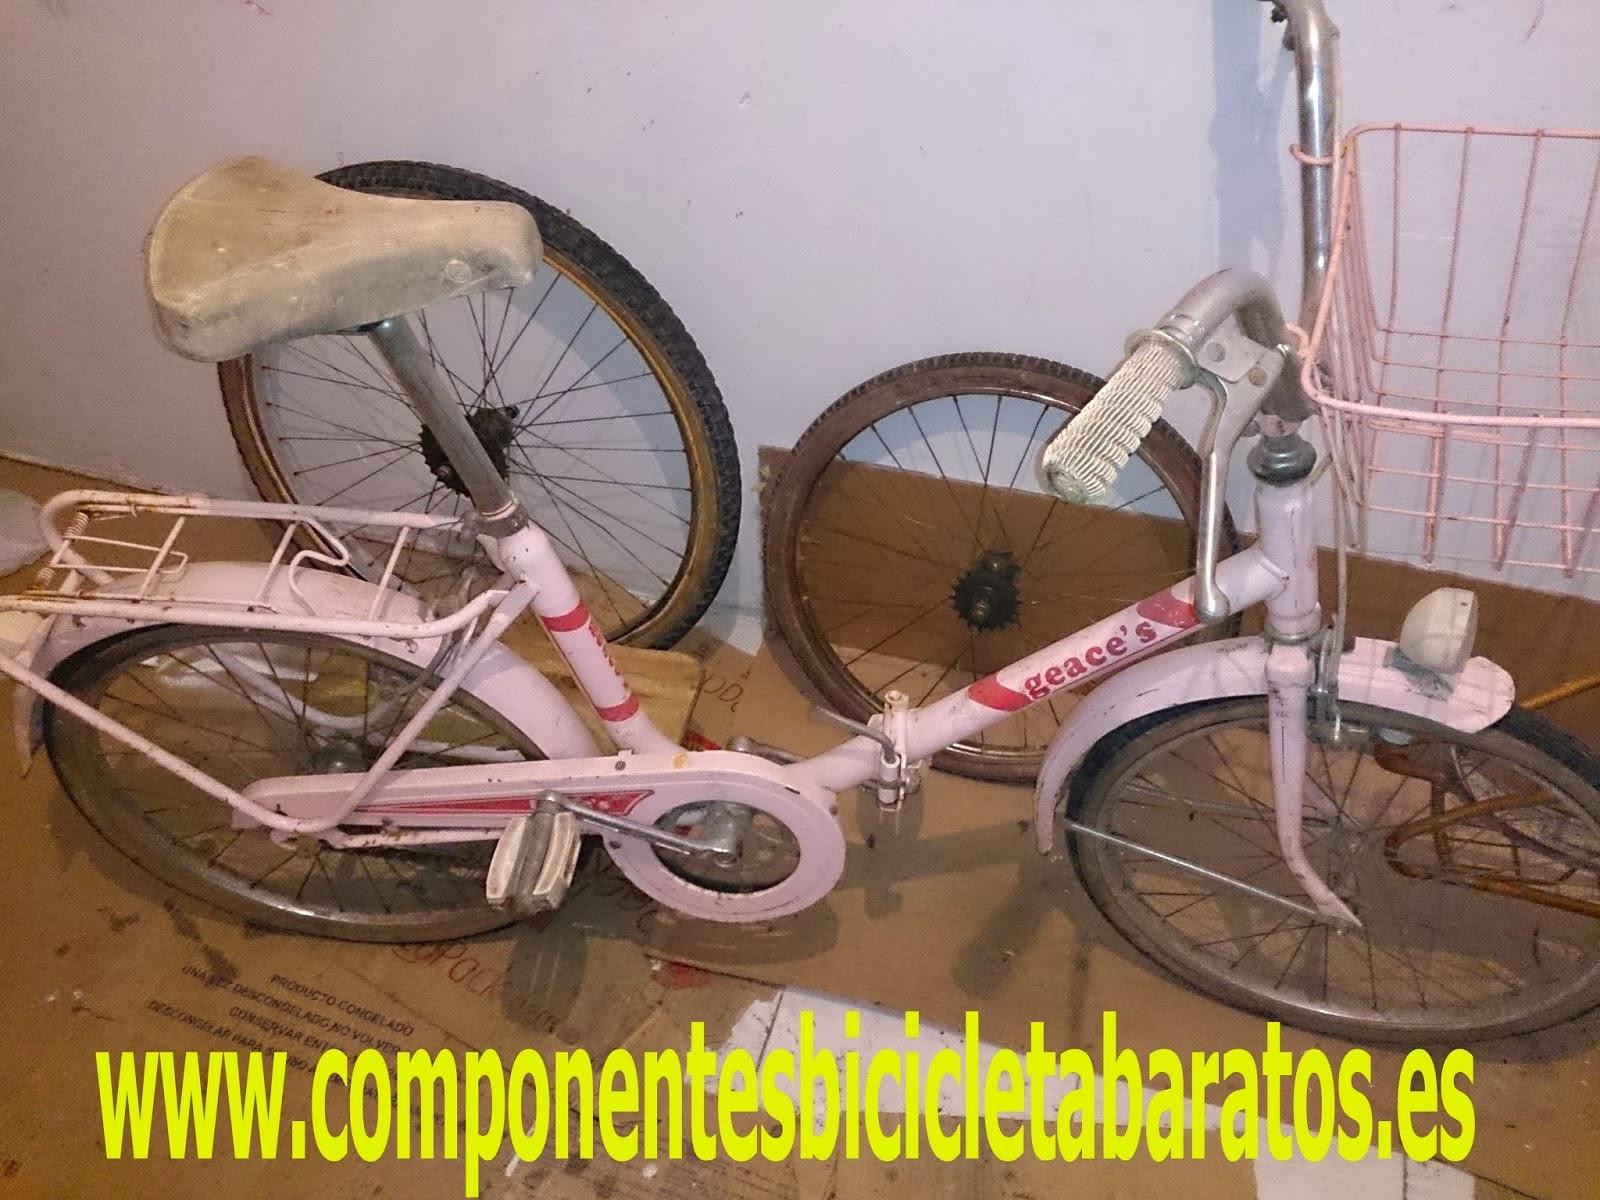 Componentes bicicleta baratos zaragoza dedicados a las - Casetas para bicicletas ...